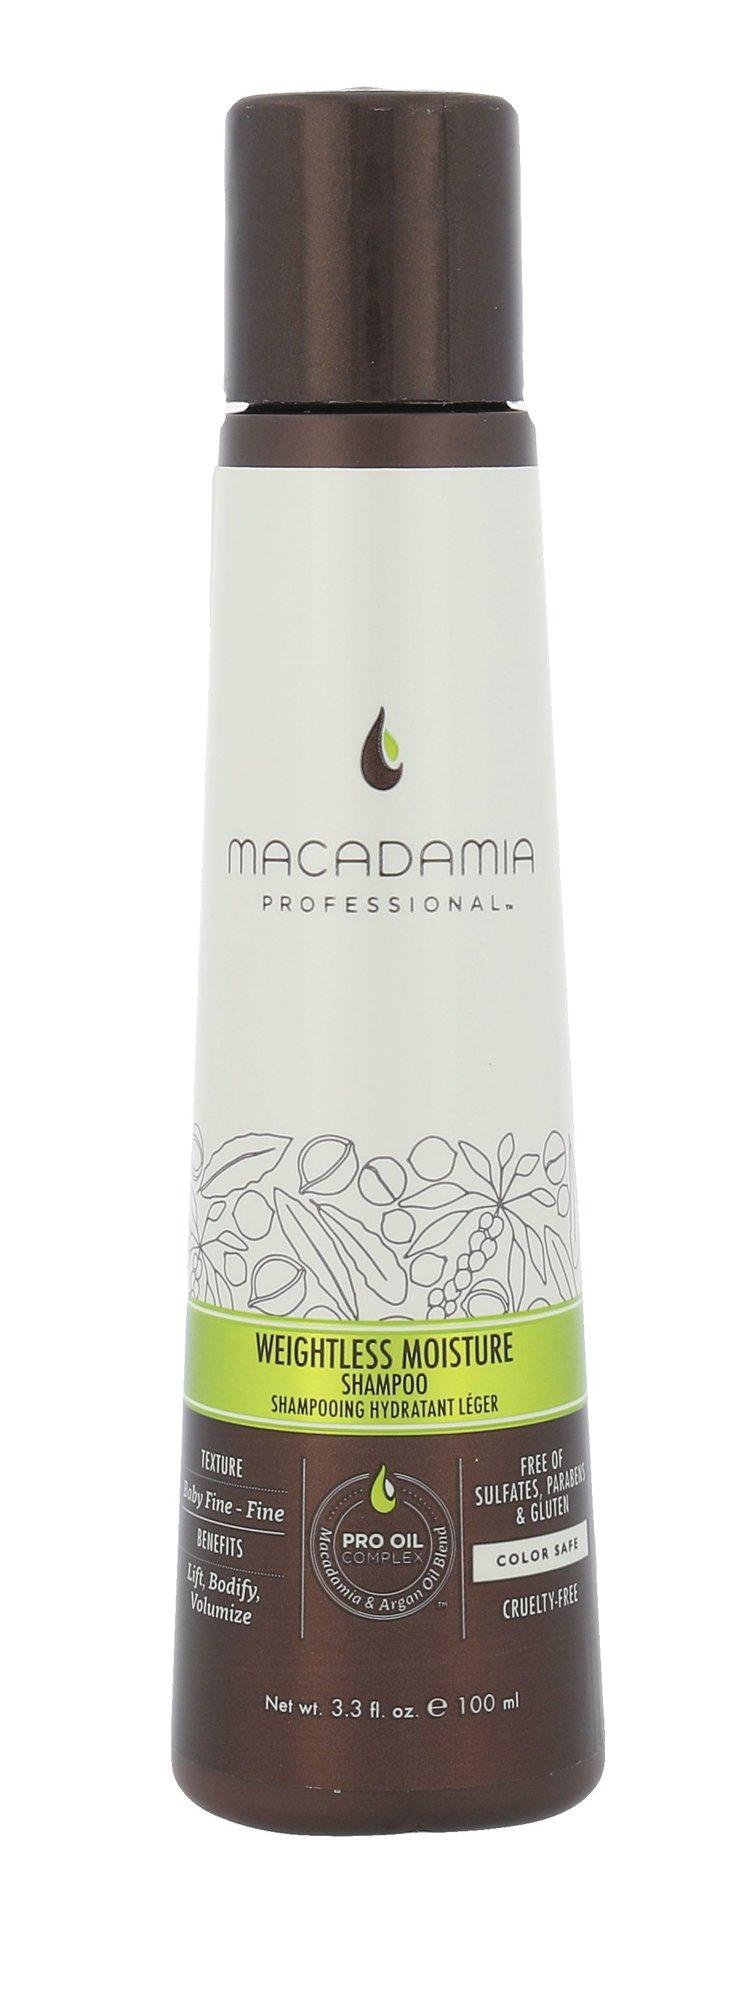 Macadamia Professional Weightless Moisture Cosmetic 100ml